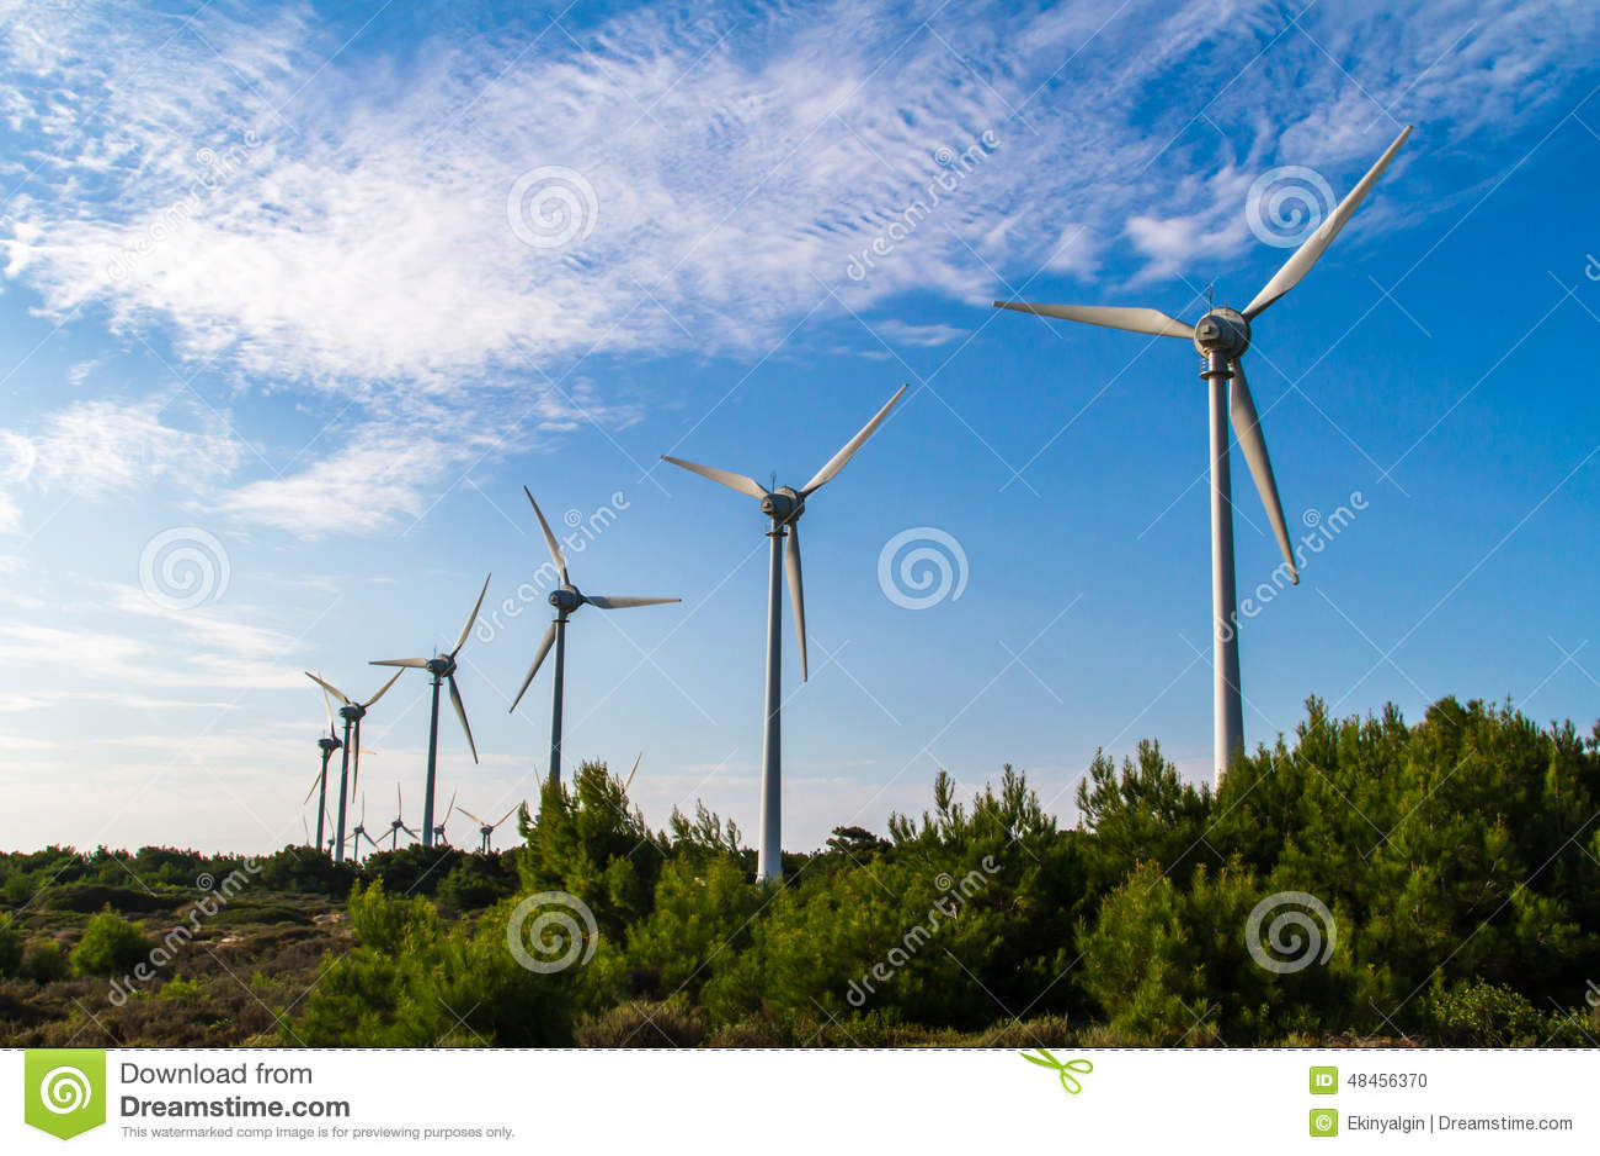 Wind Turbines for Renewable Energy